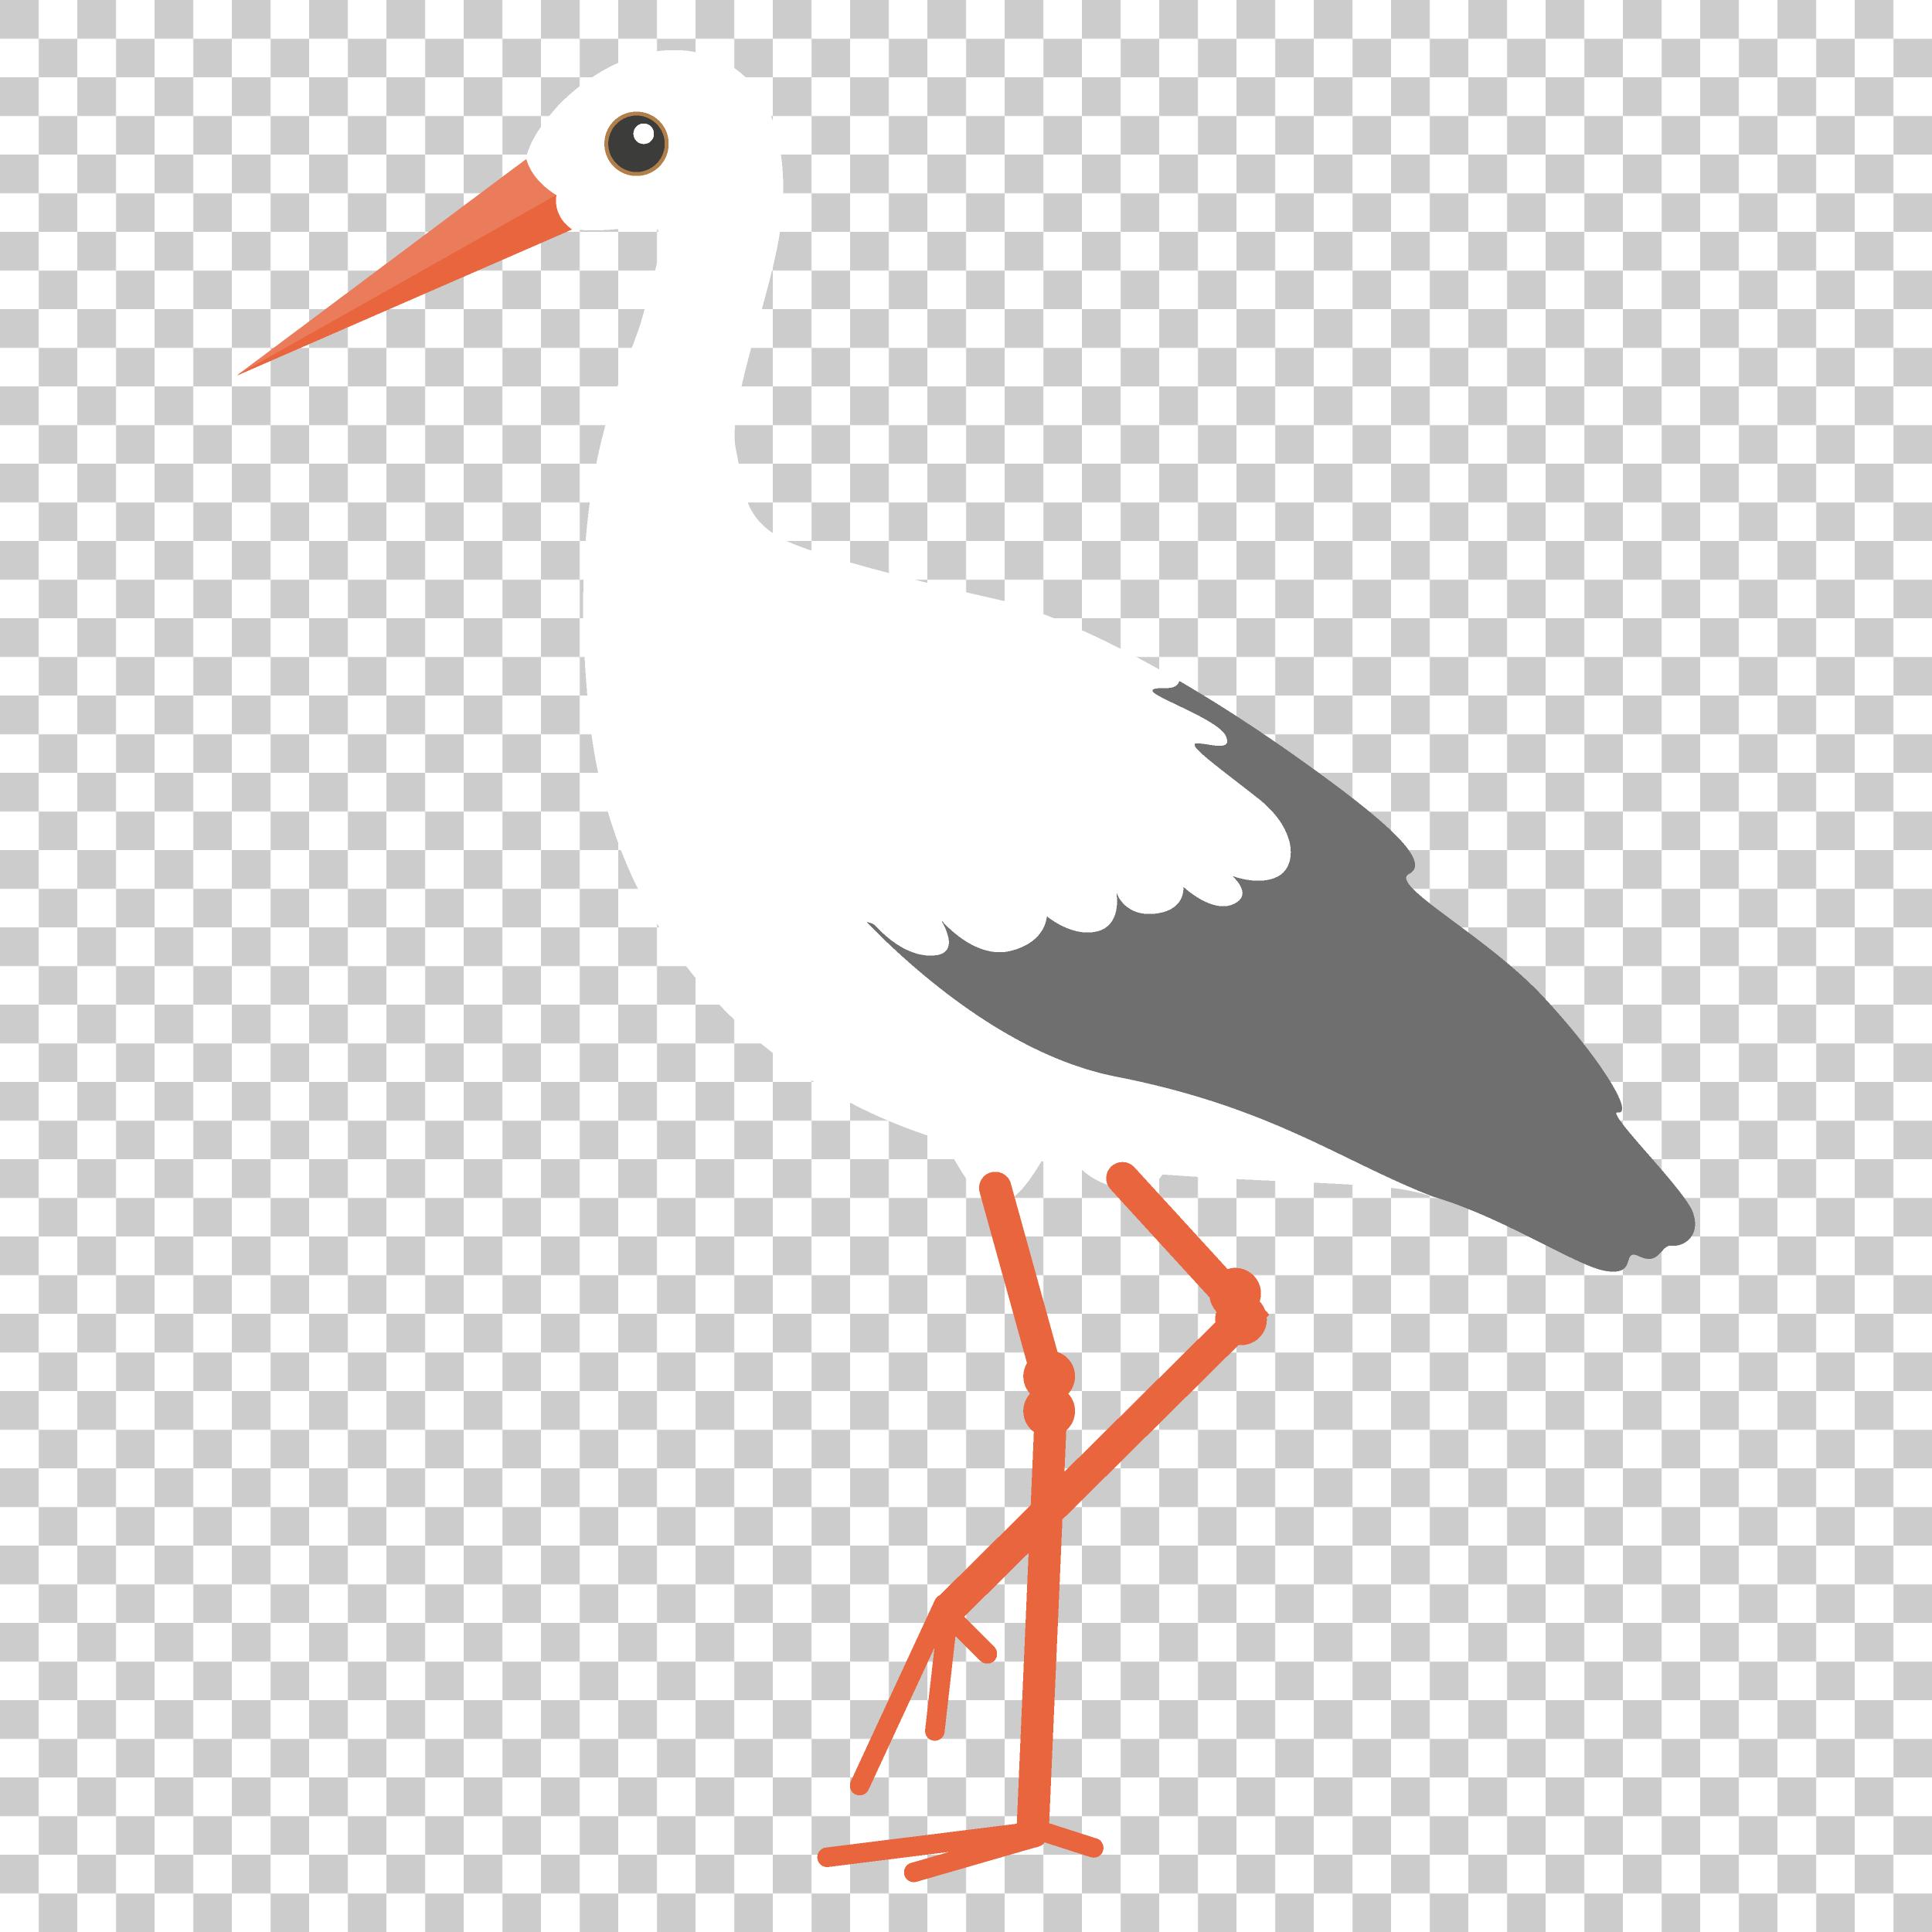 Crane Stork Bird Png Image With Transparent Background Stork Stork Bird Bird